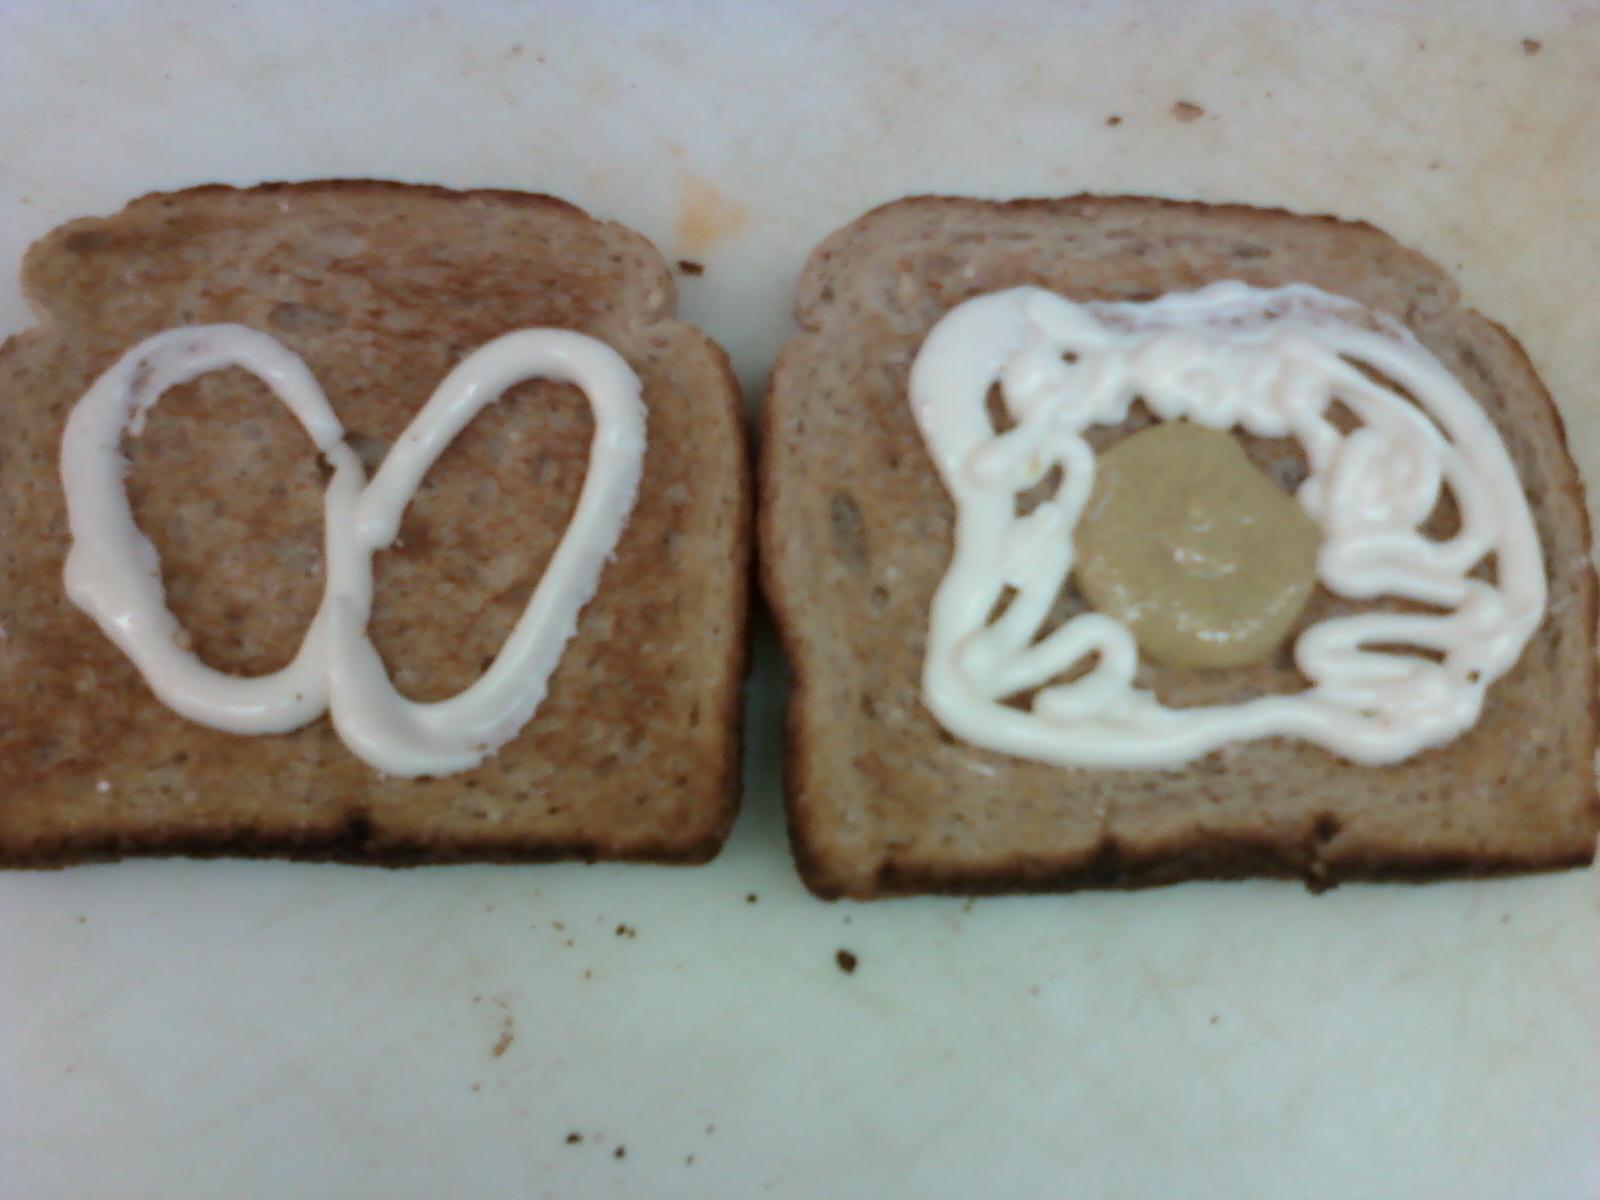 sandwich_art/0804111147.jpg